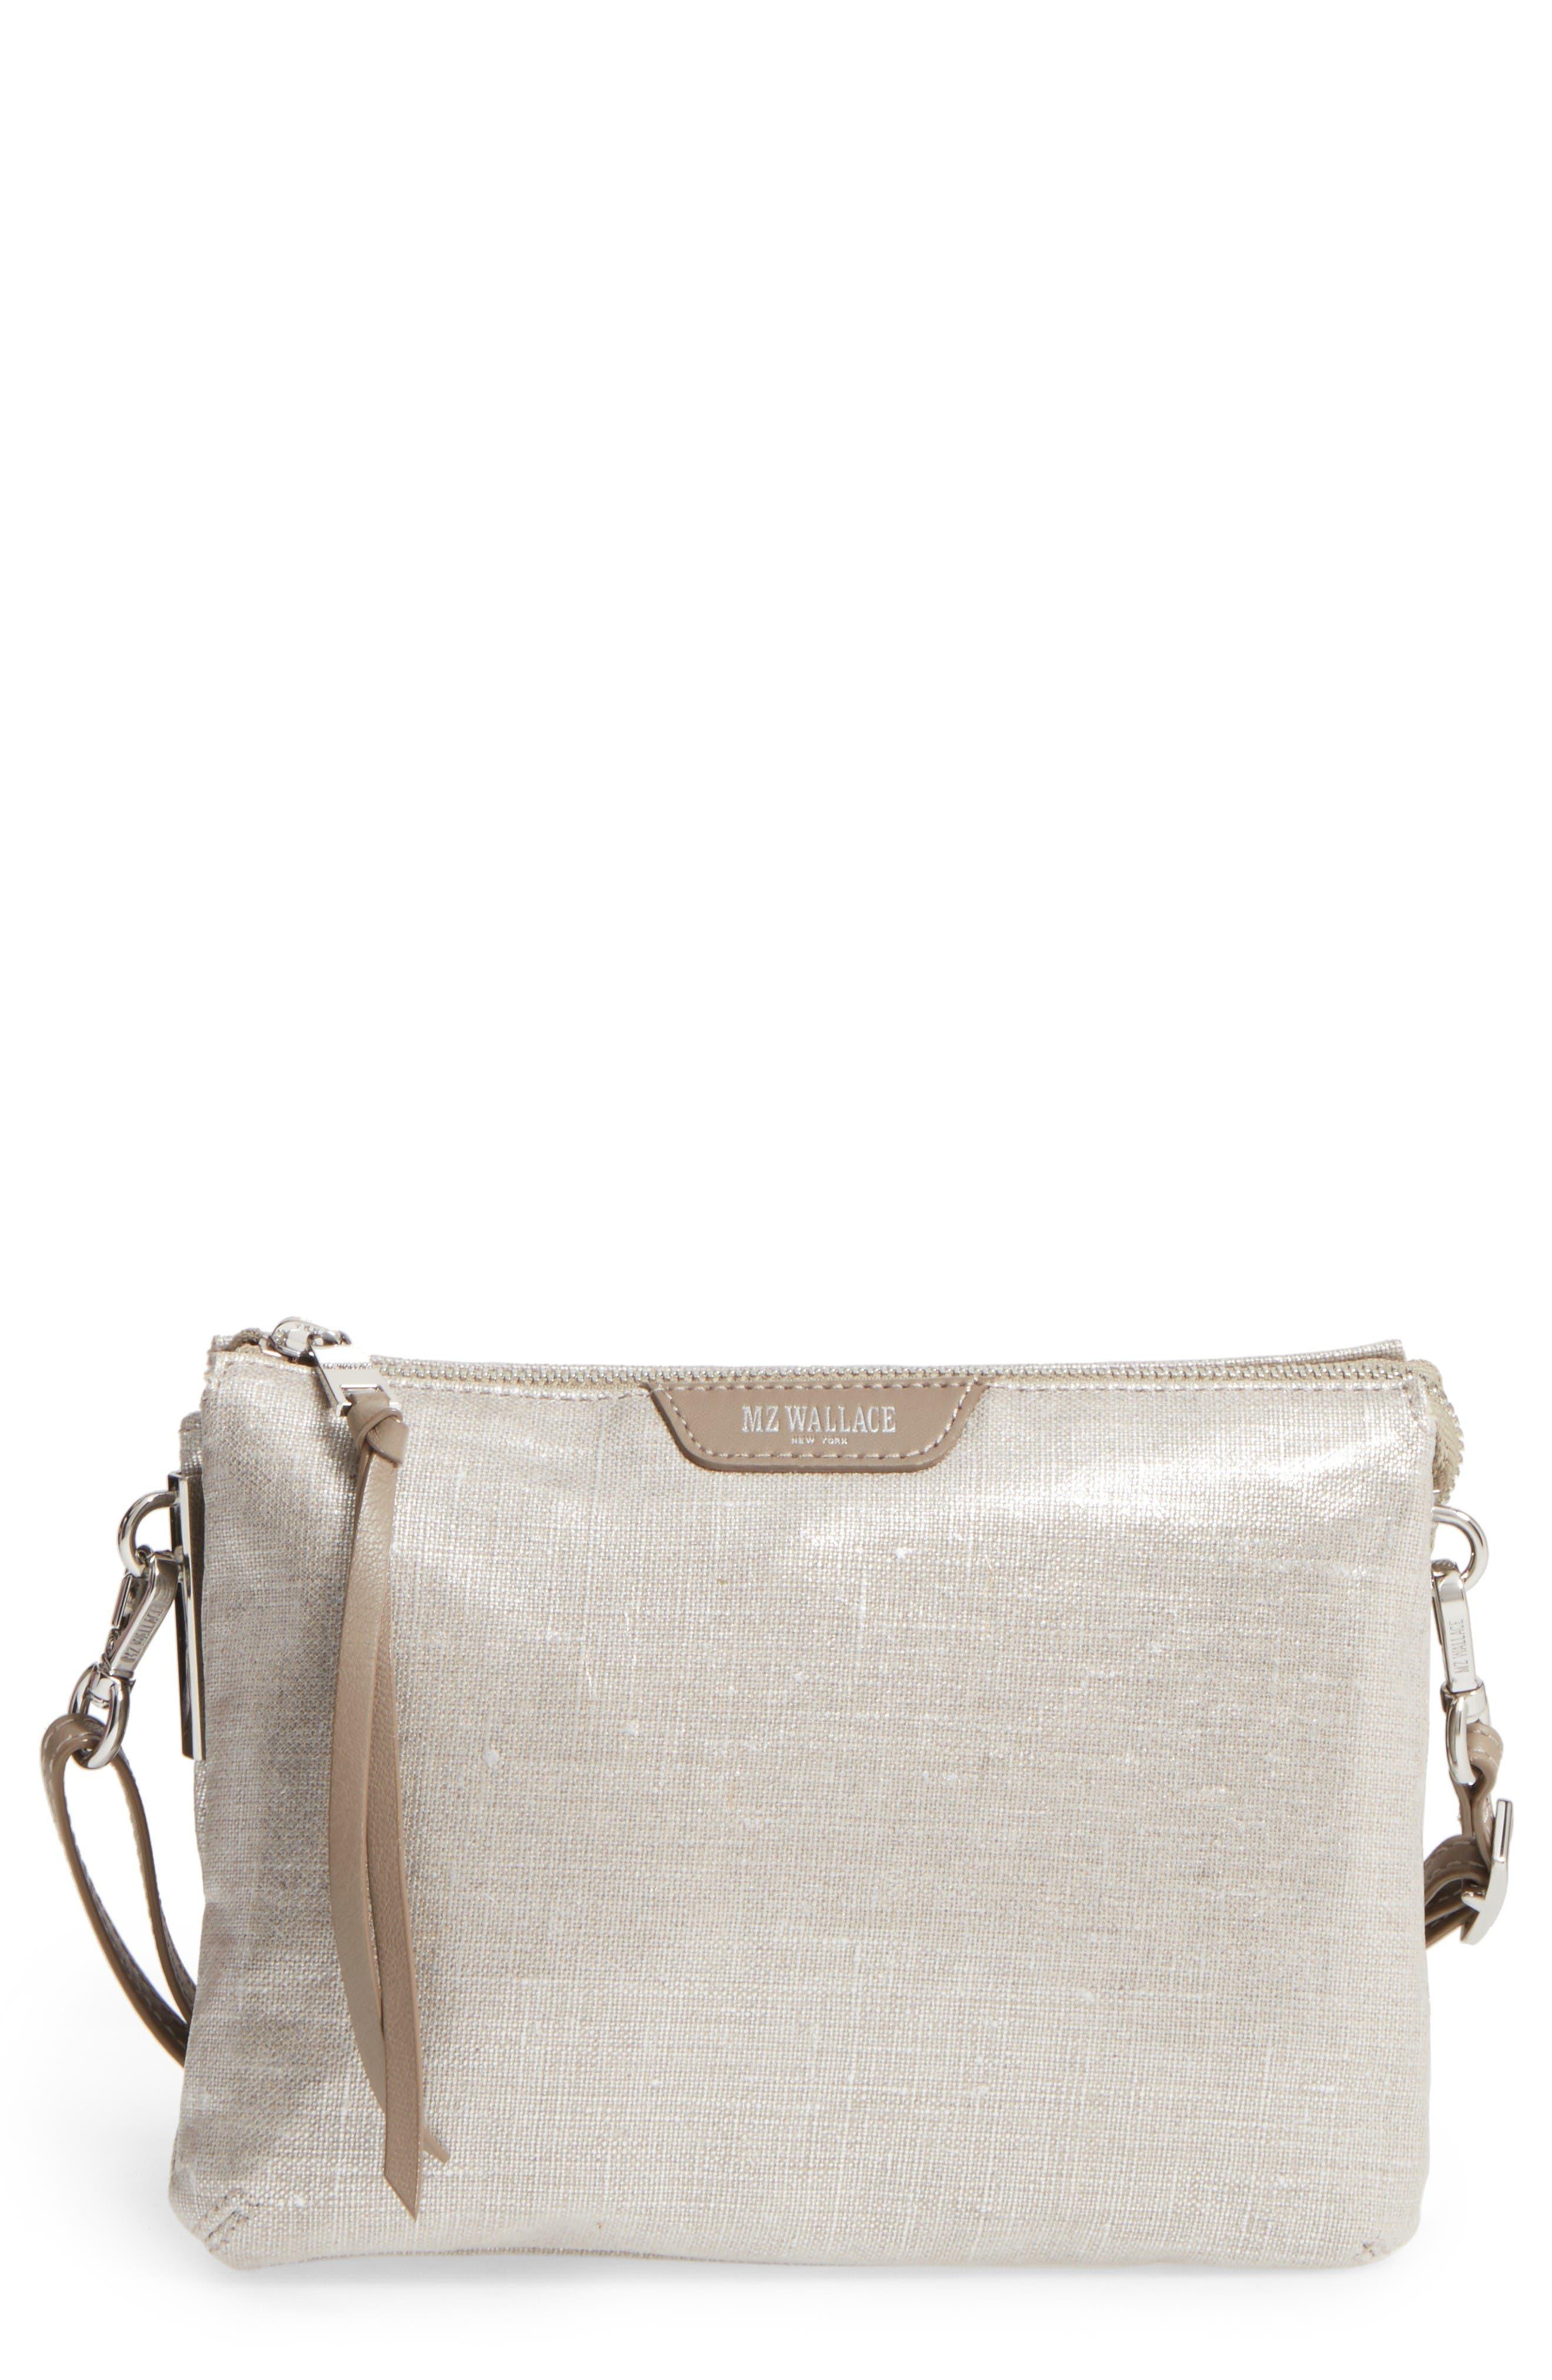 Main Image - MZ Wallace 'Pippa' Bedford Nylon Crossbody Bag